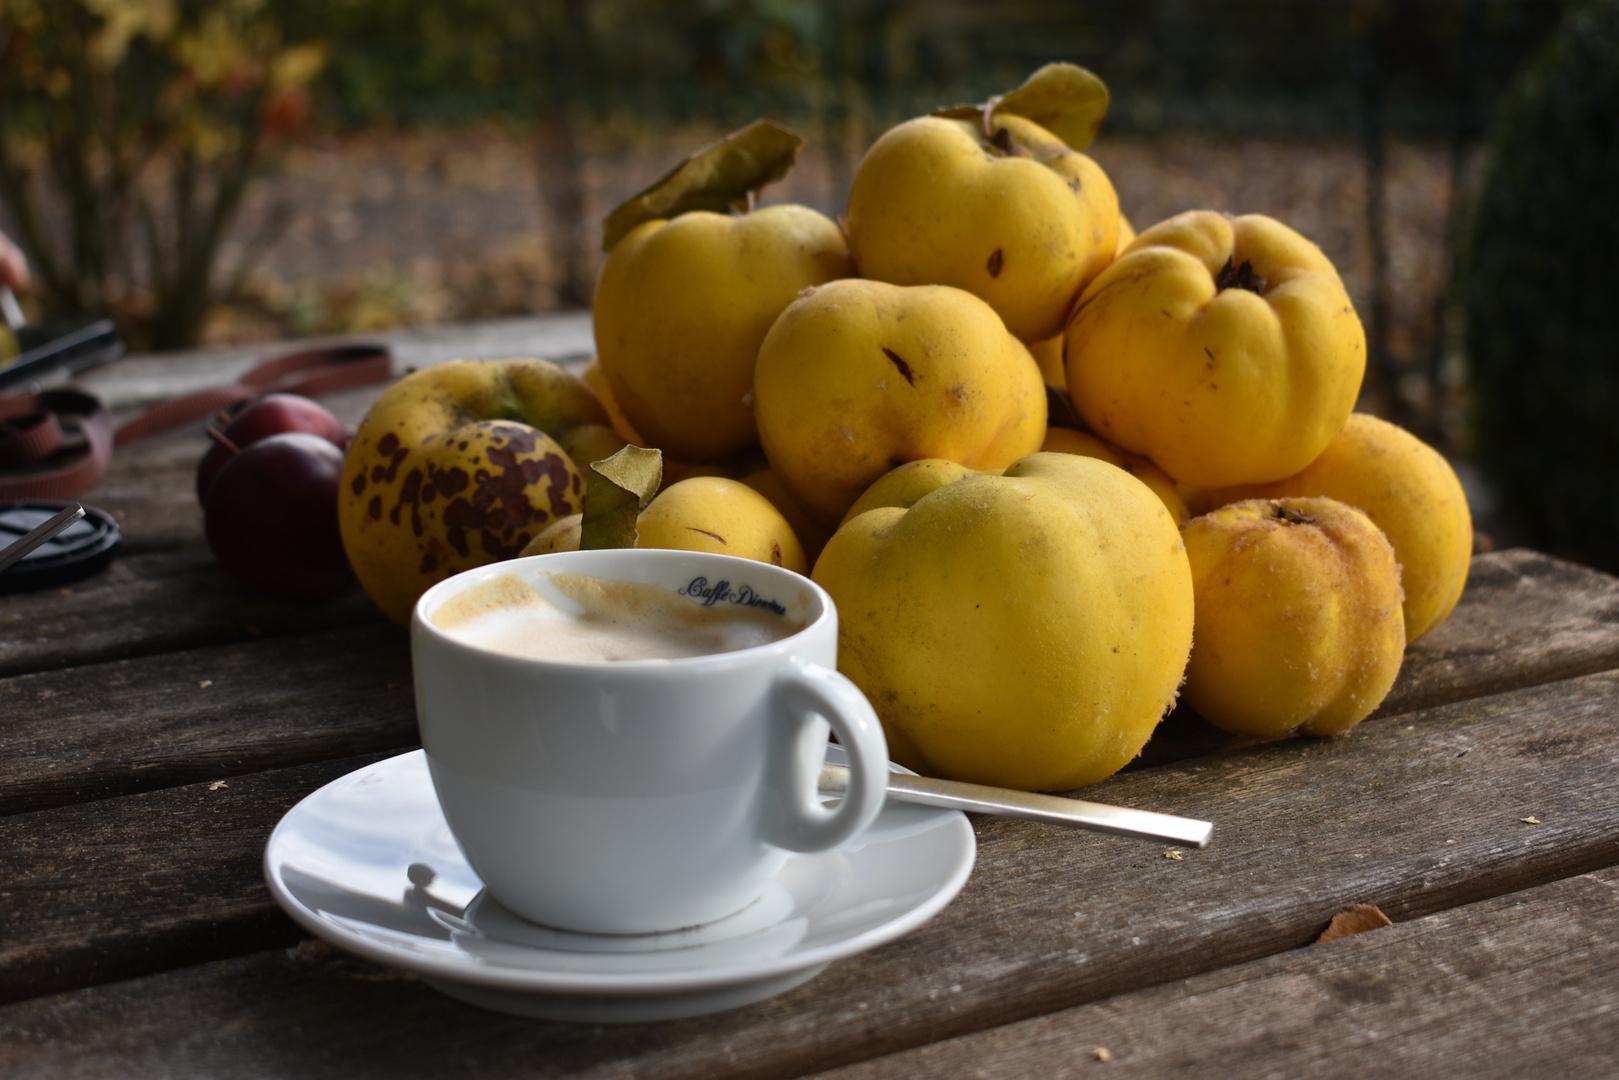 Kaffeepause - Days